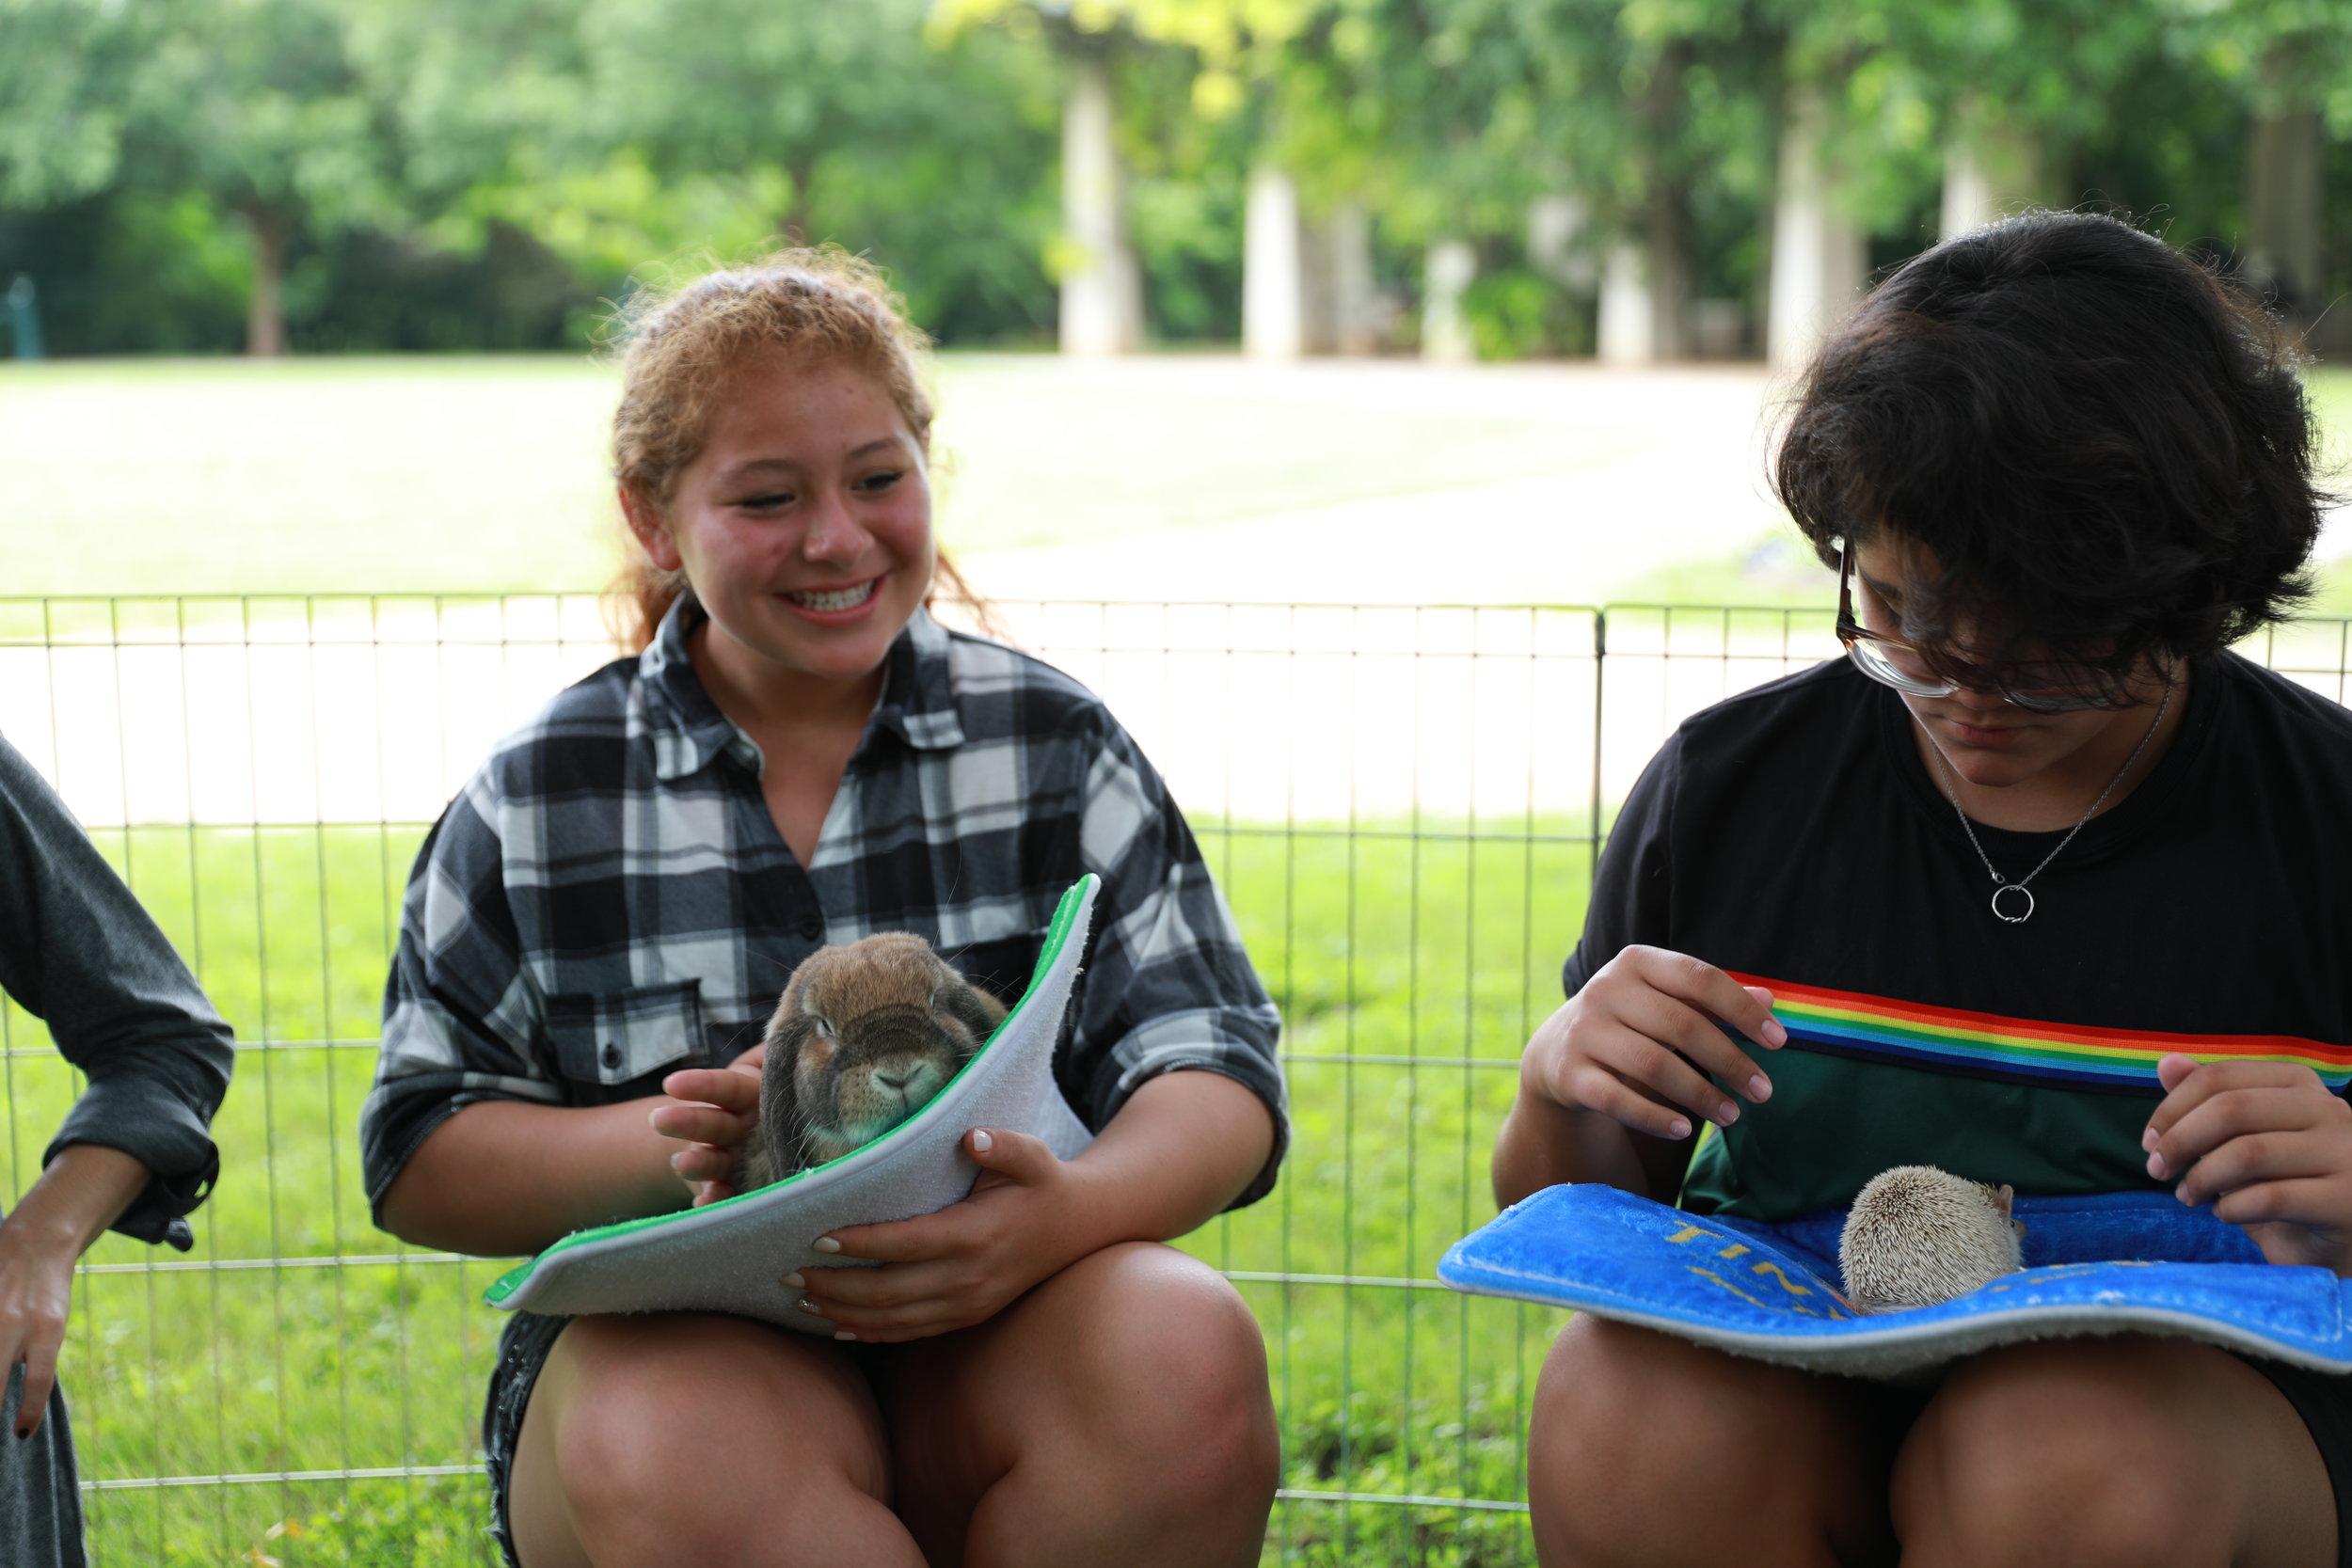 teenage-birthday-party-petting-zoo.JPG